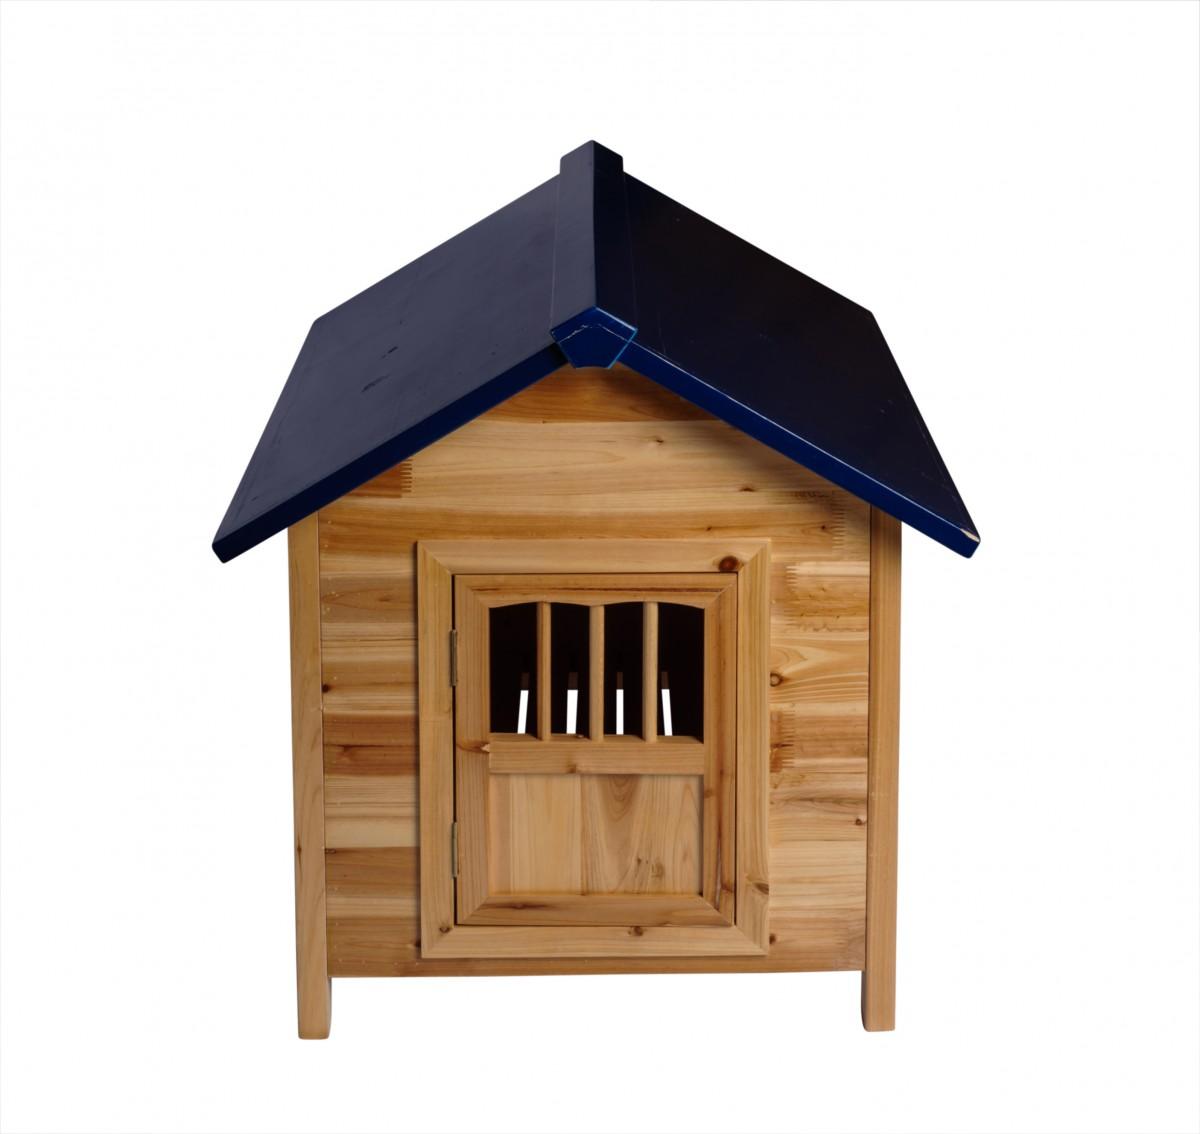 Wooden Dog House Outdoor Pet Shelter Bed Medium w Window Wooden Dog House Dog House Outdoor pet shelter